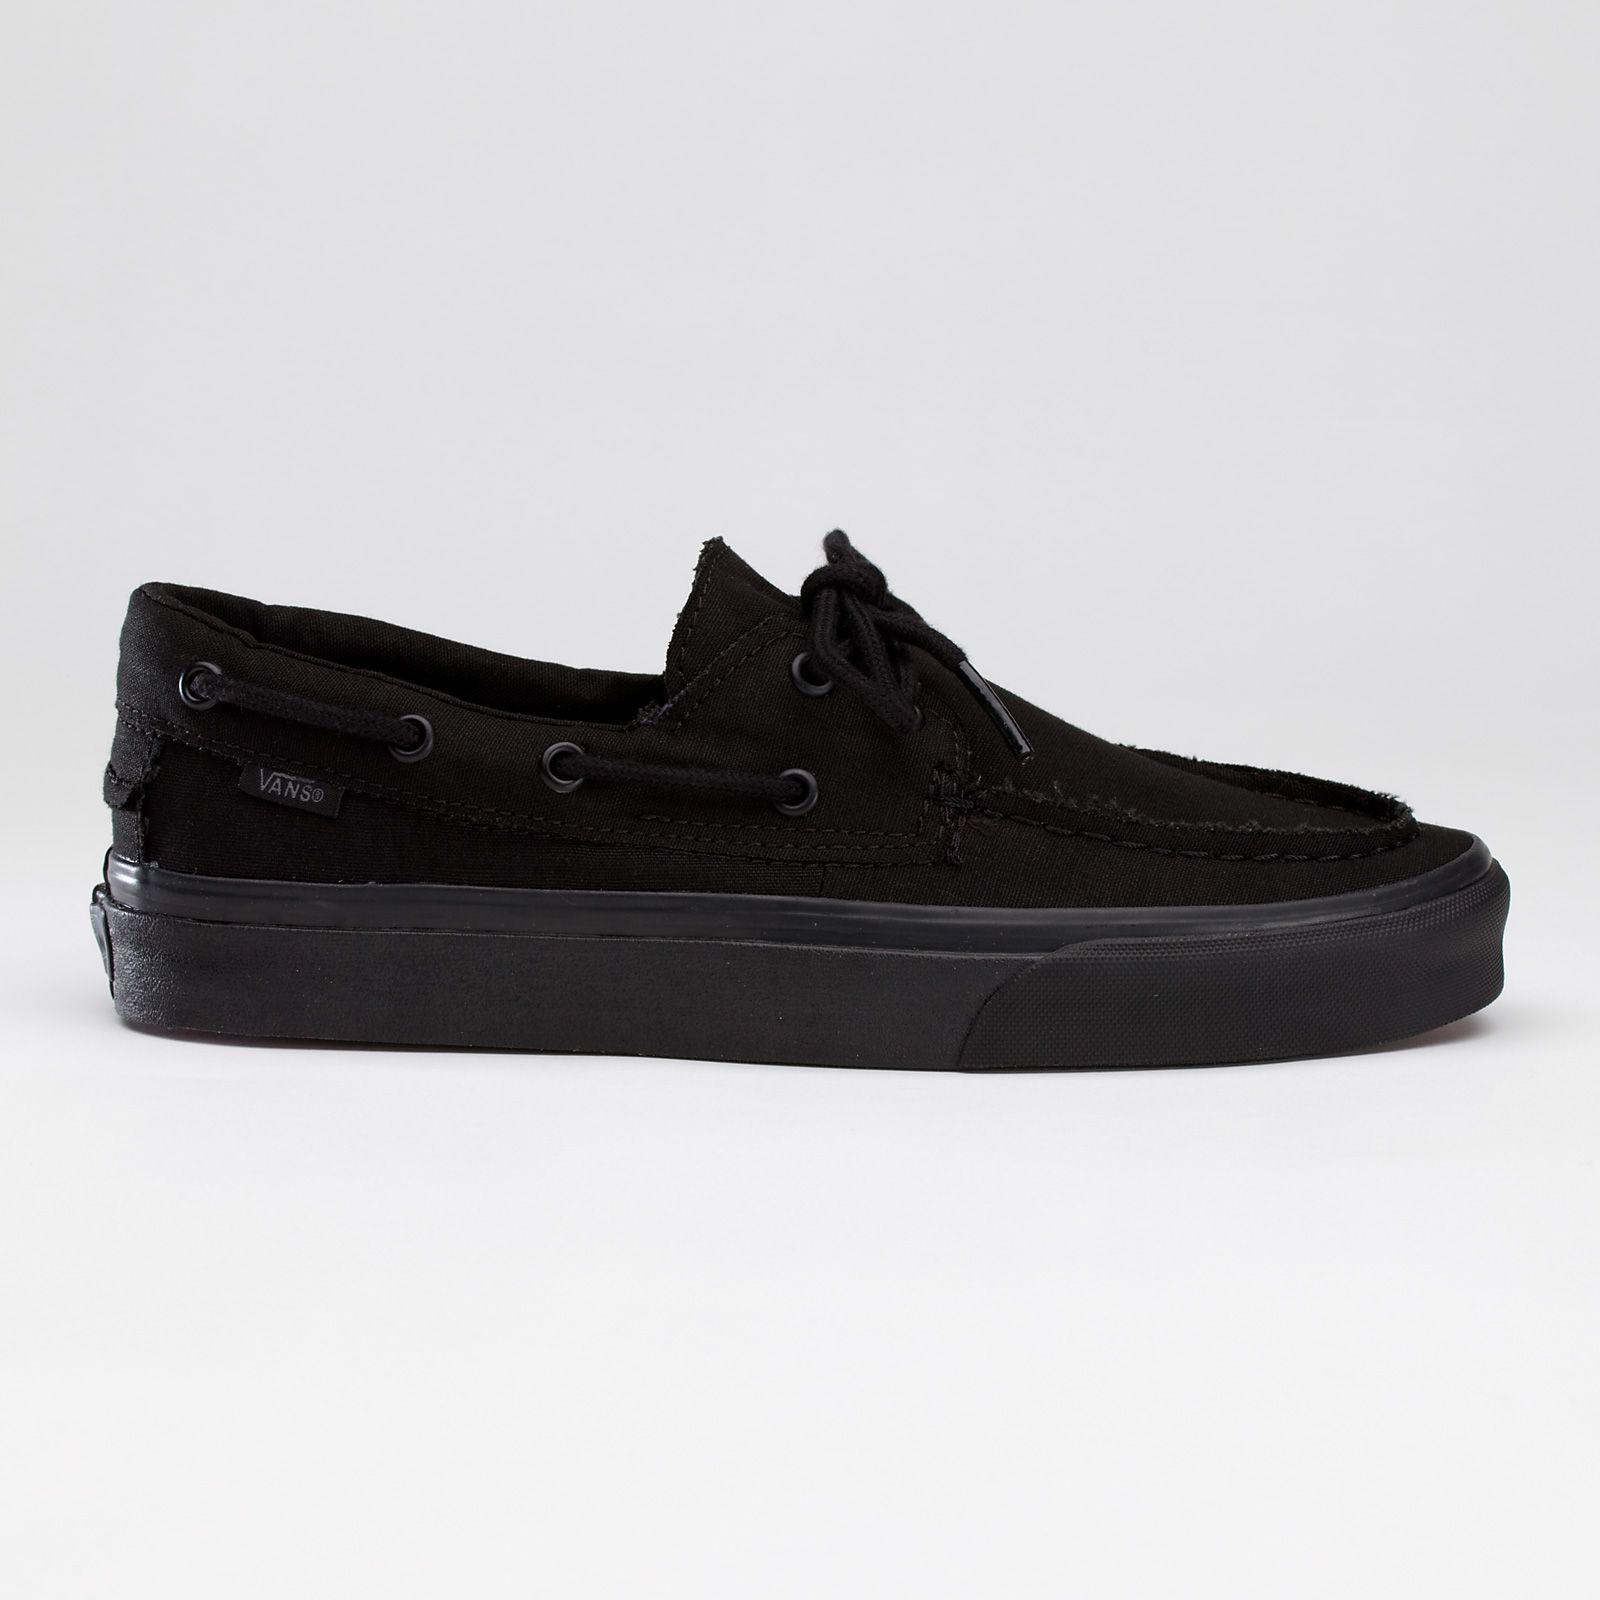 Boat shoes, Sperry boat shoe, Vans